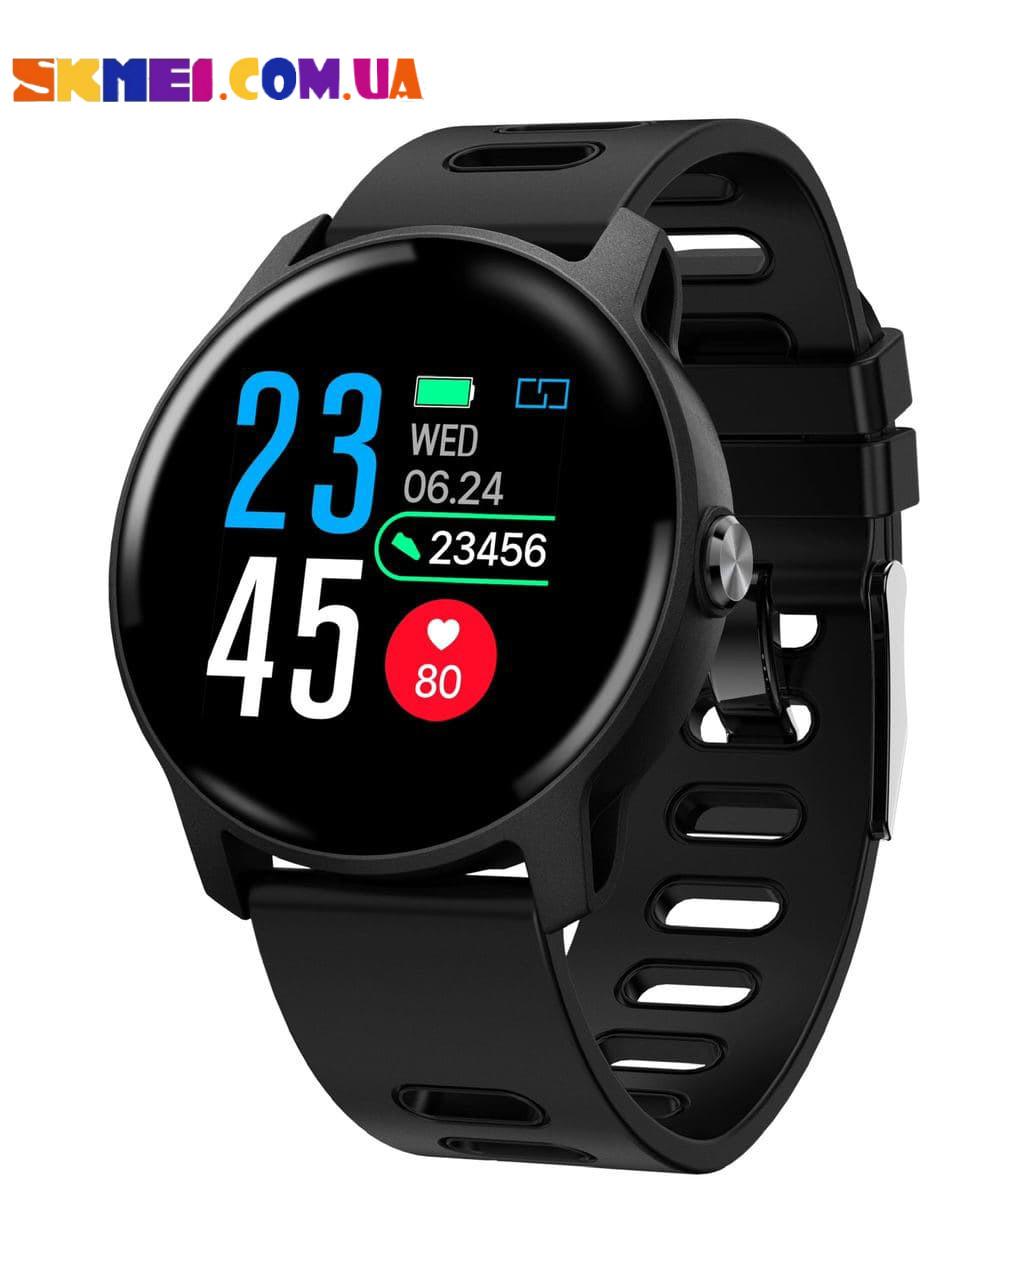 Смарт-часы Skmei Q8 Pro